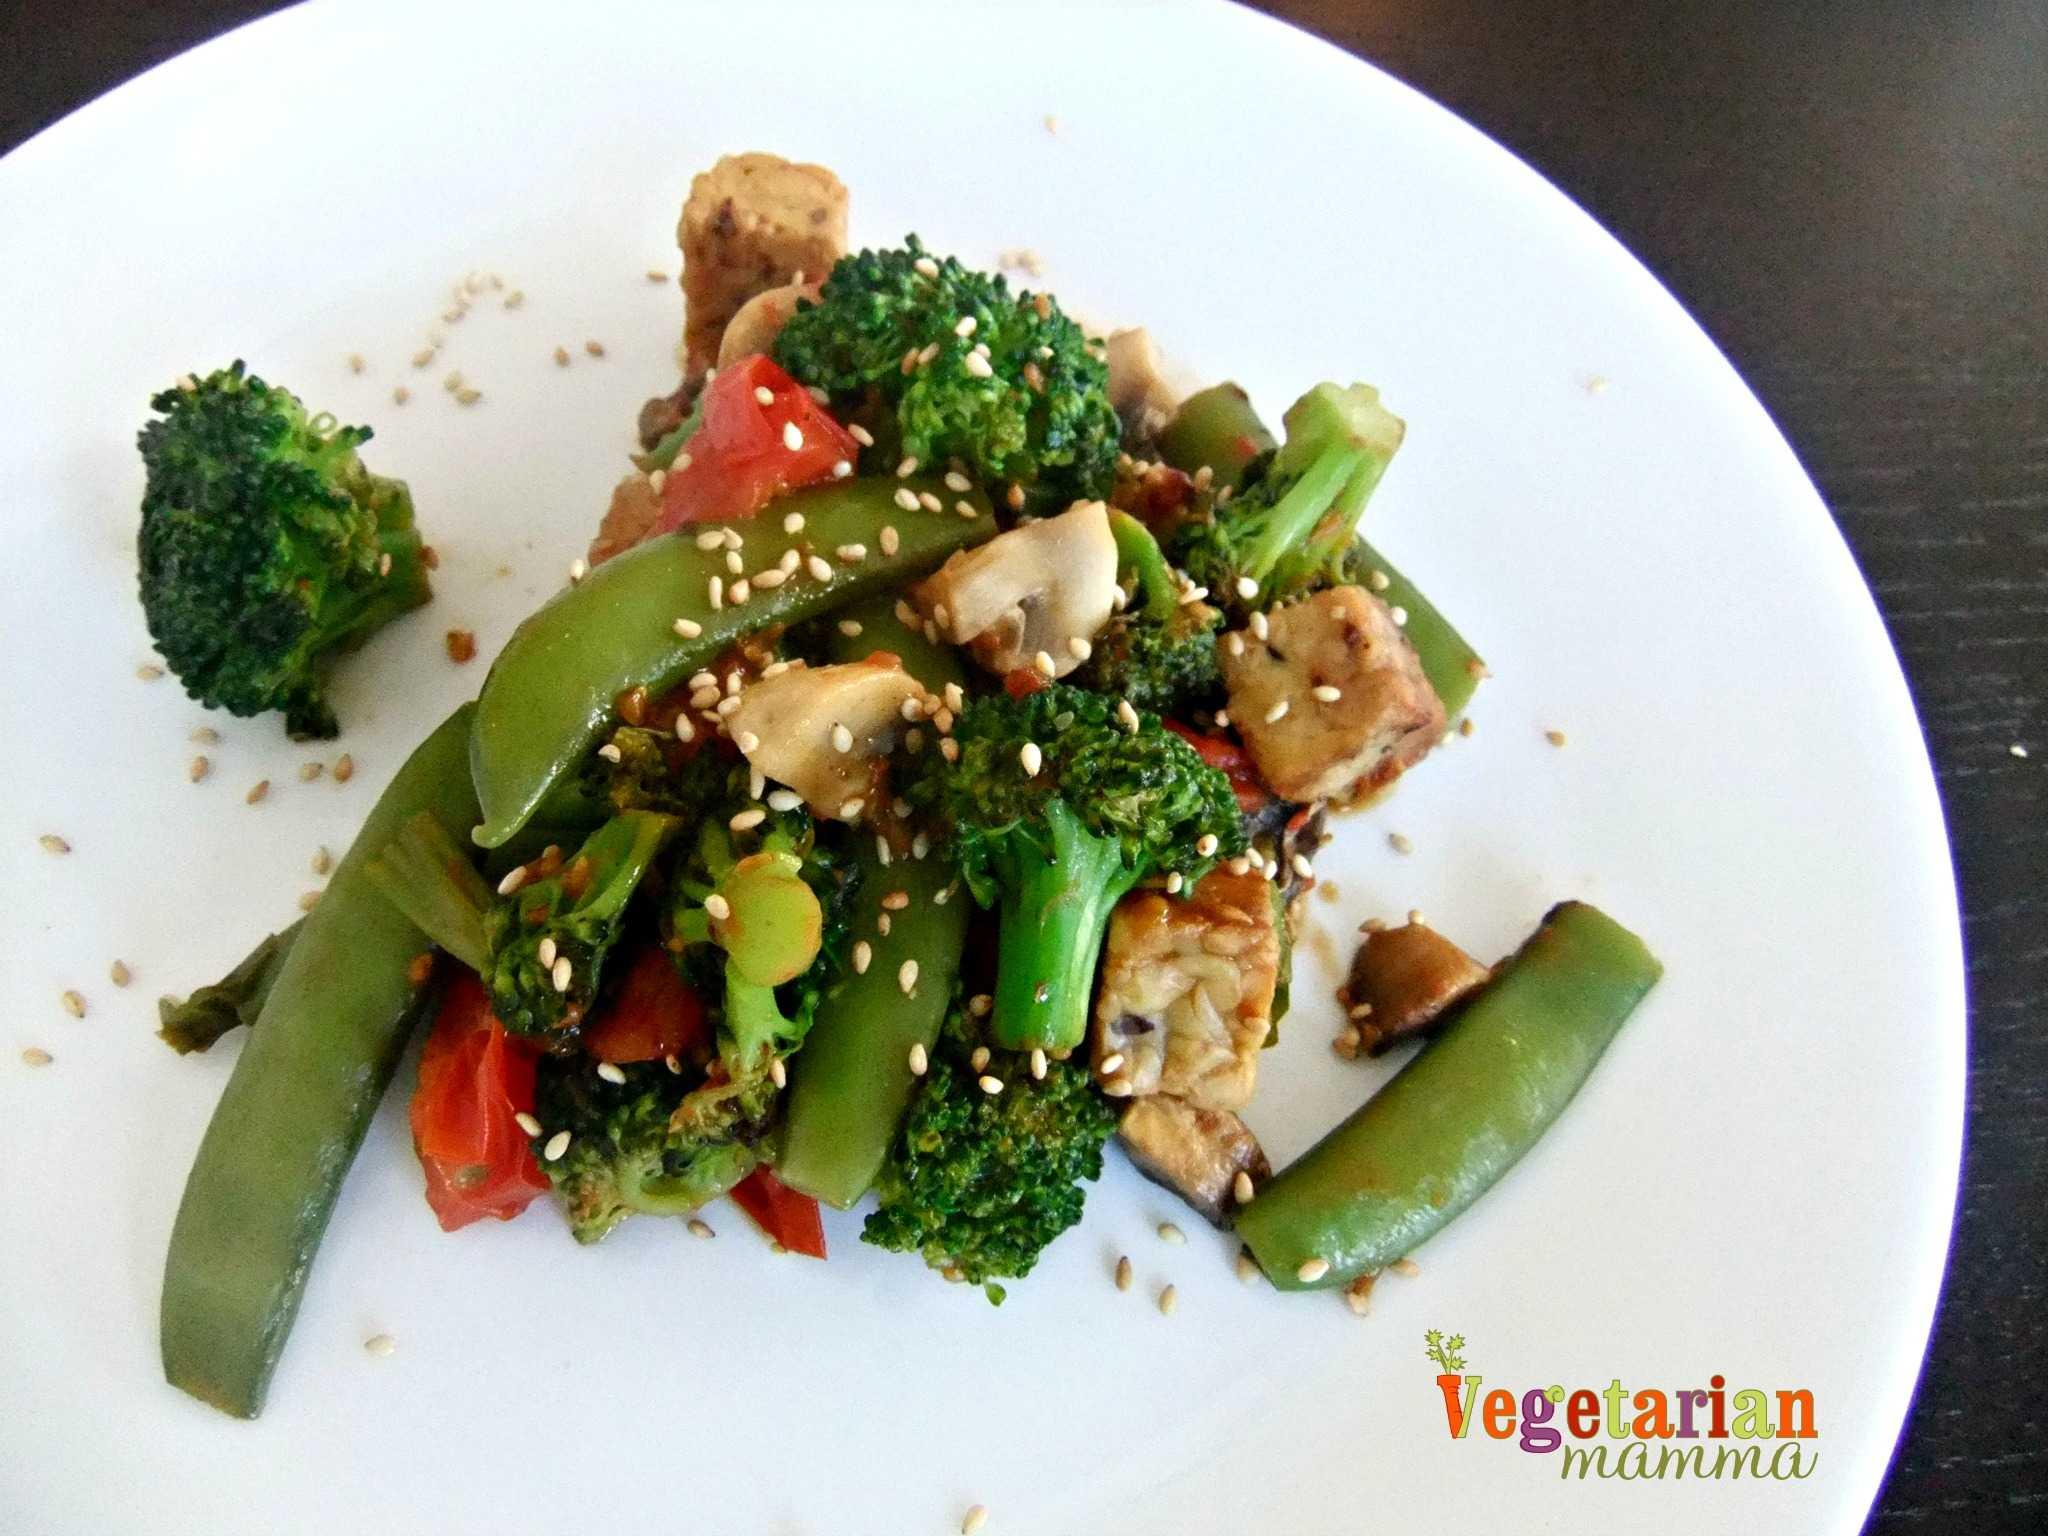 Vegetable Tempeh Stir Fry - #glutenfree #vegan - Vegetarian Mamma